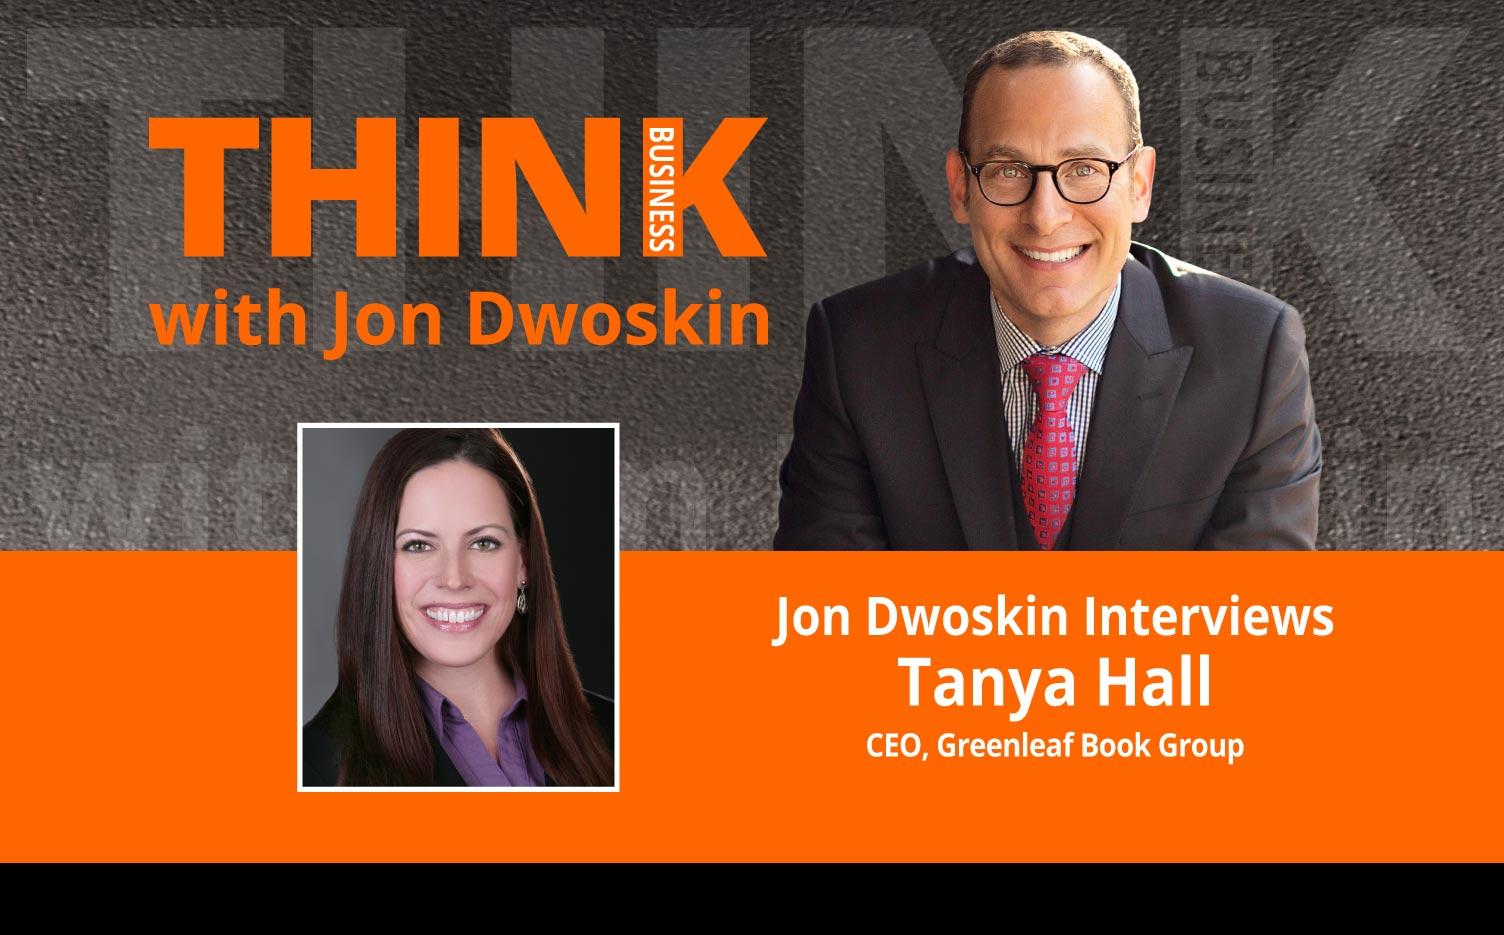 THINK Business Podcast: Jon Dwoskin Interviews Tanya Hall